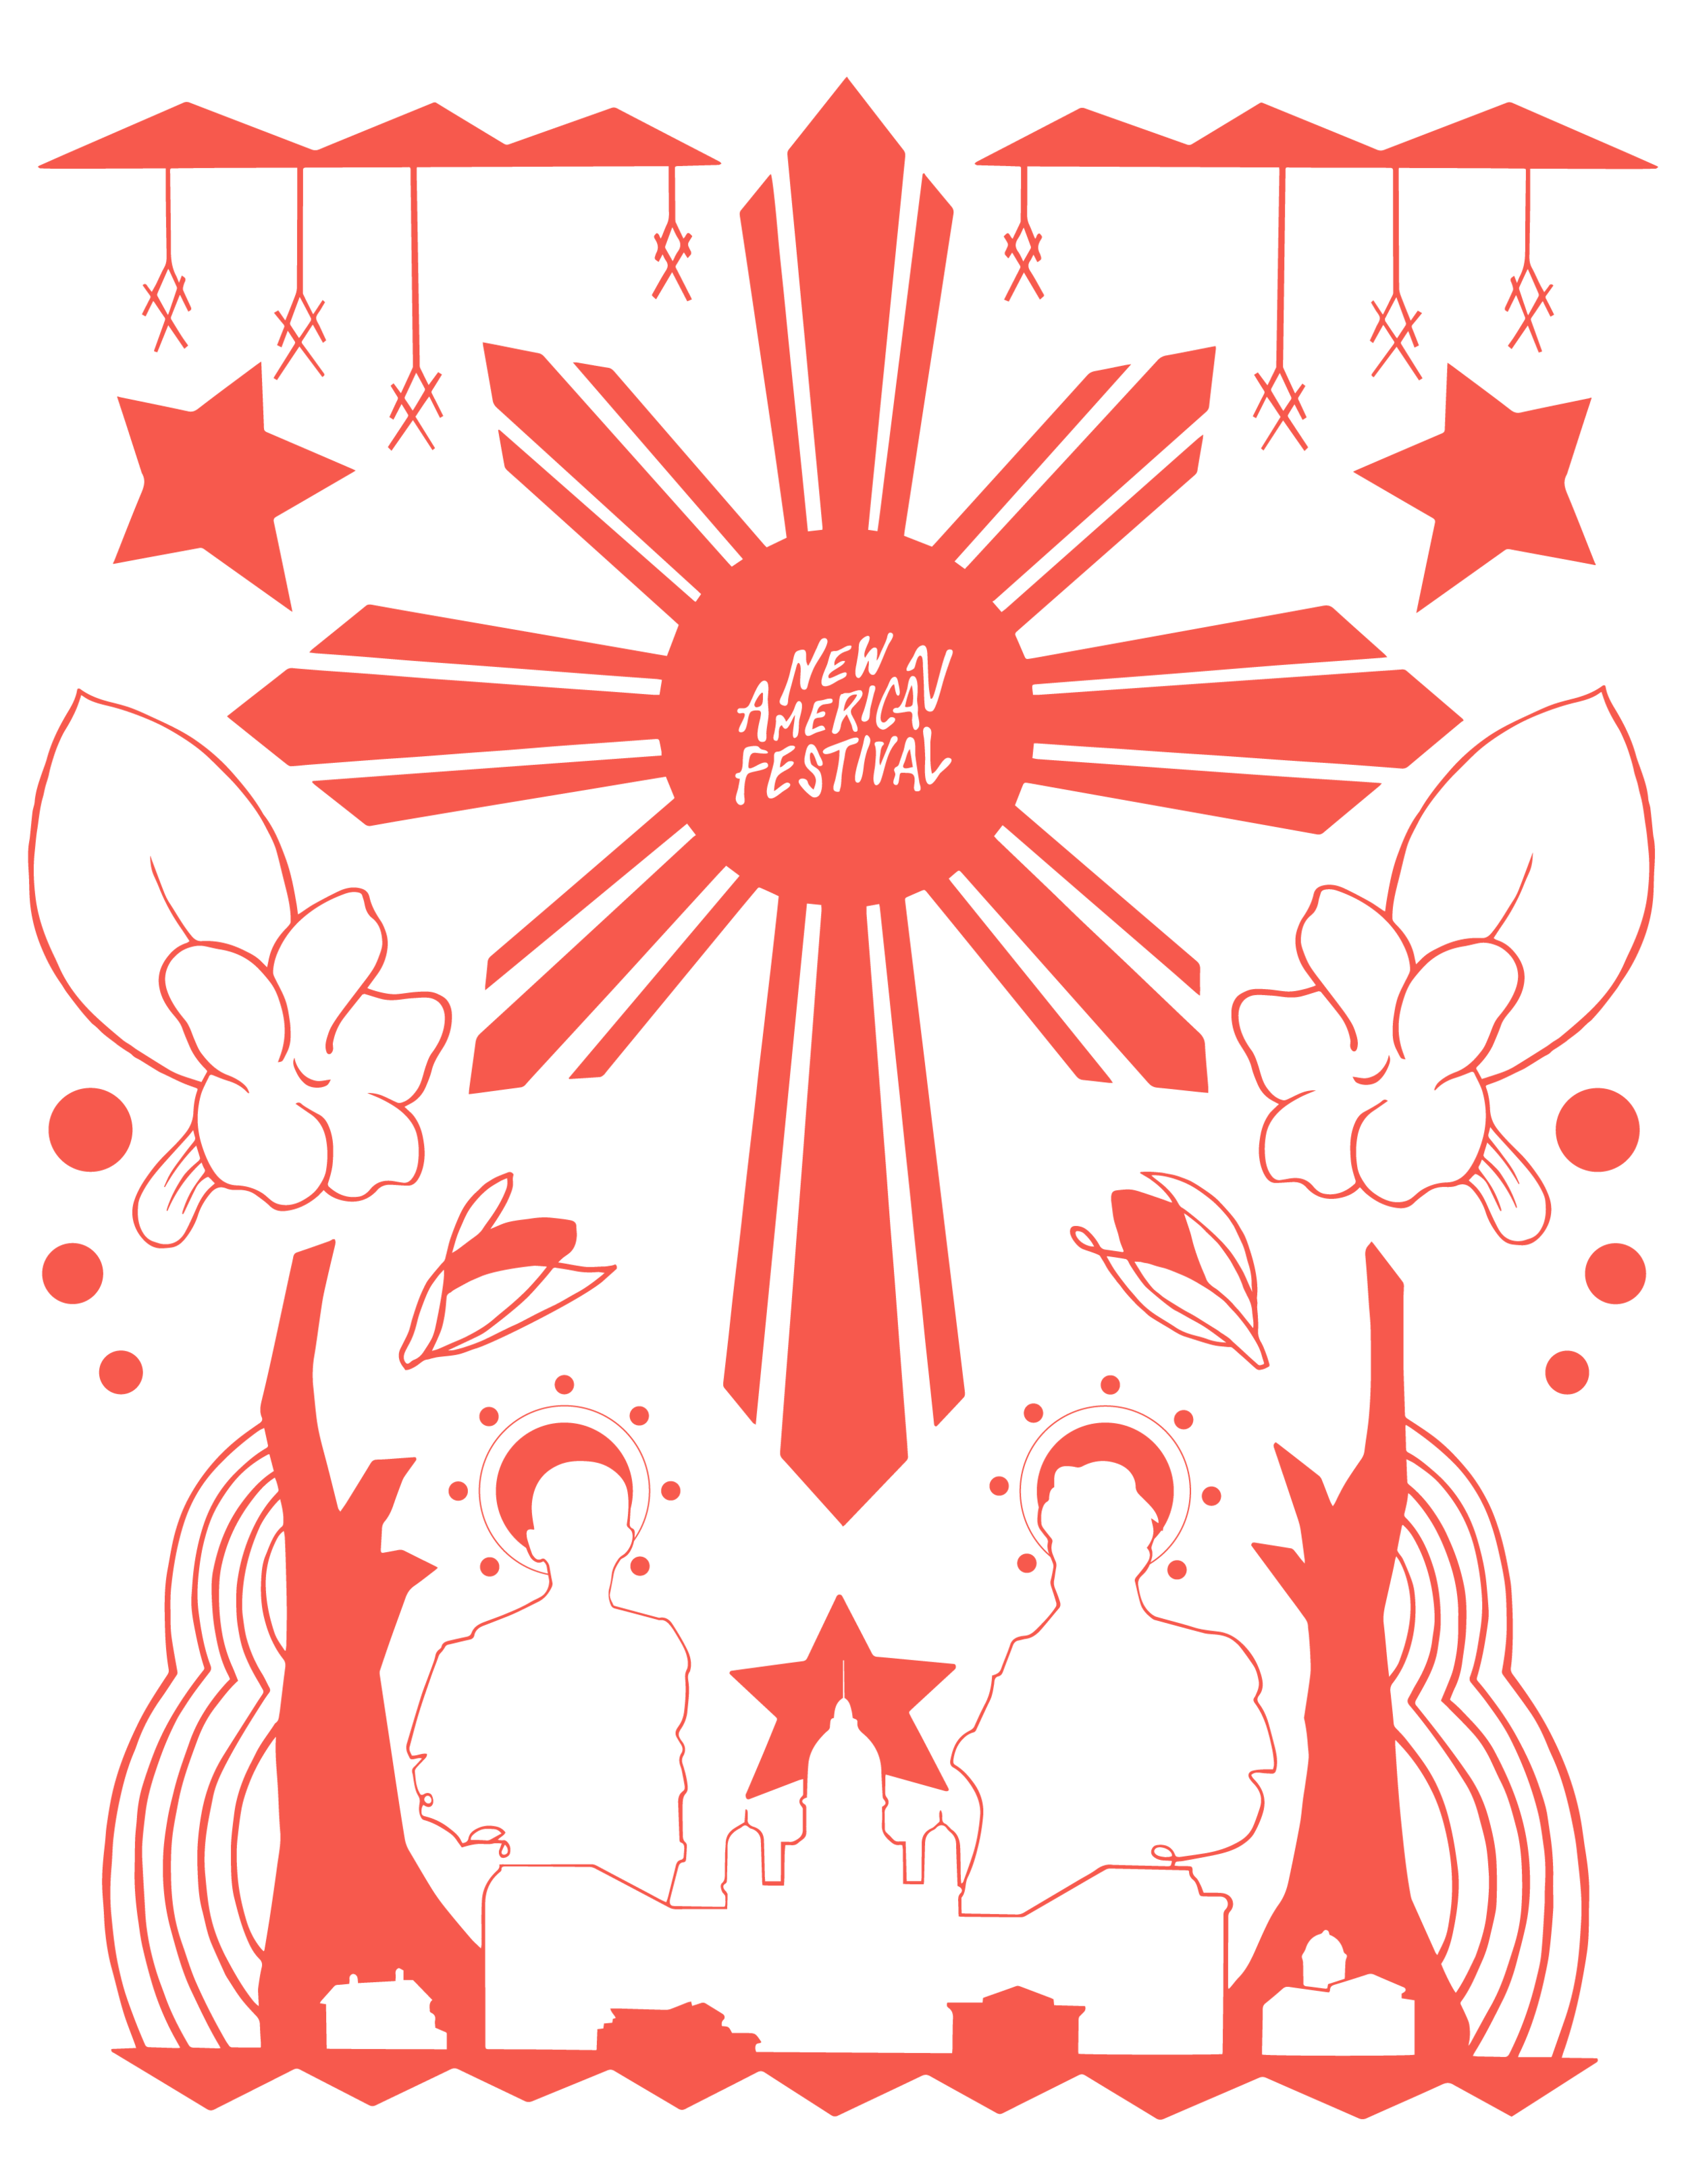 Design by Victoria-Riza for New American Economy for the New American Festival